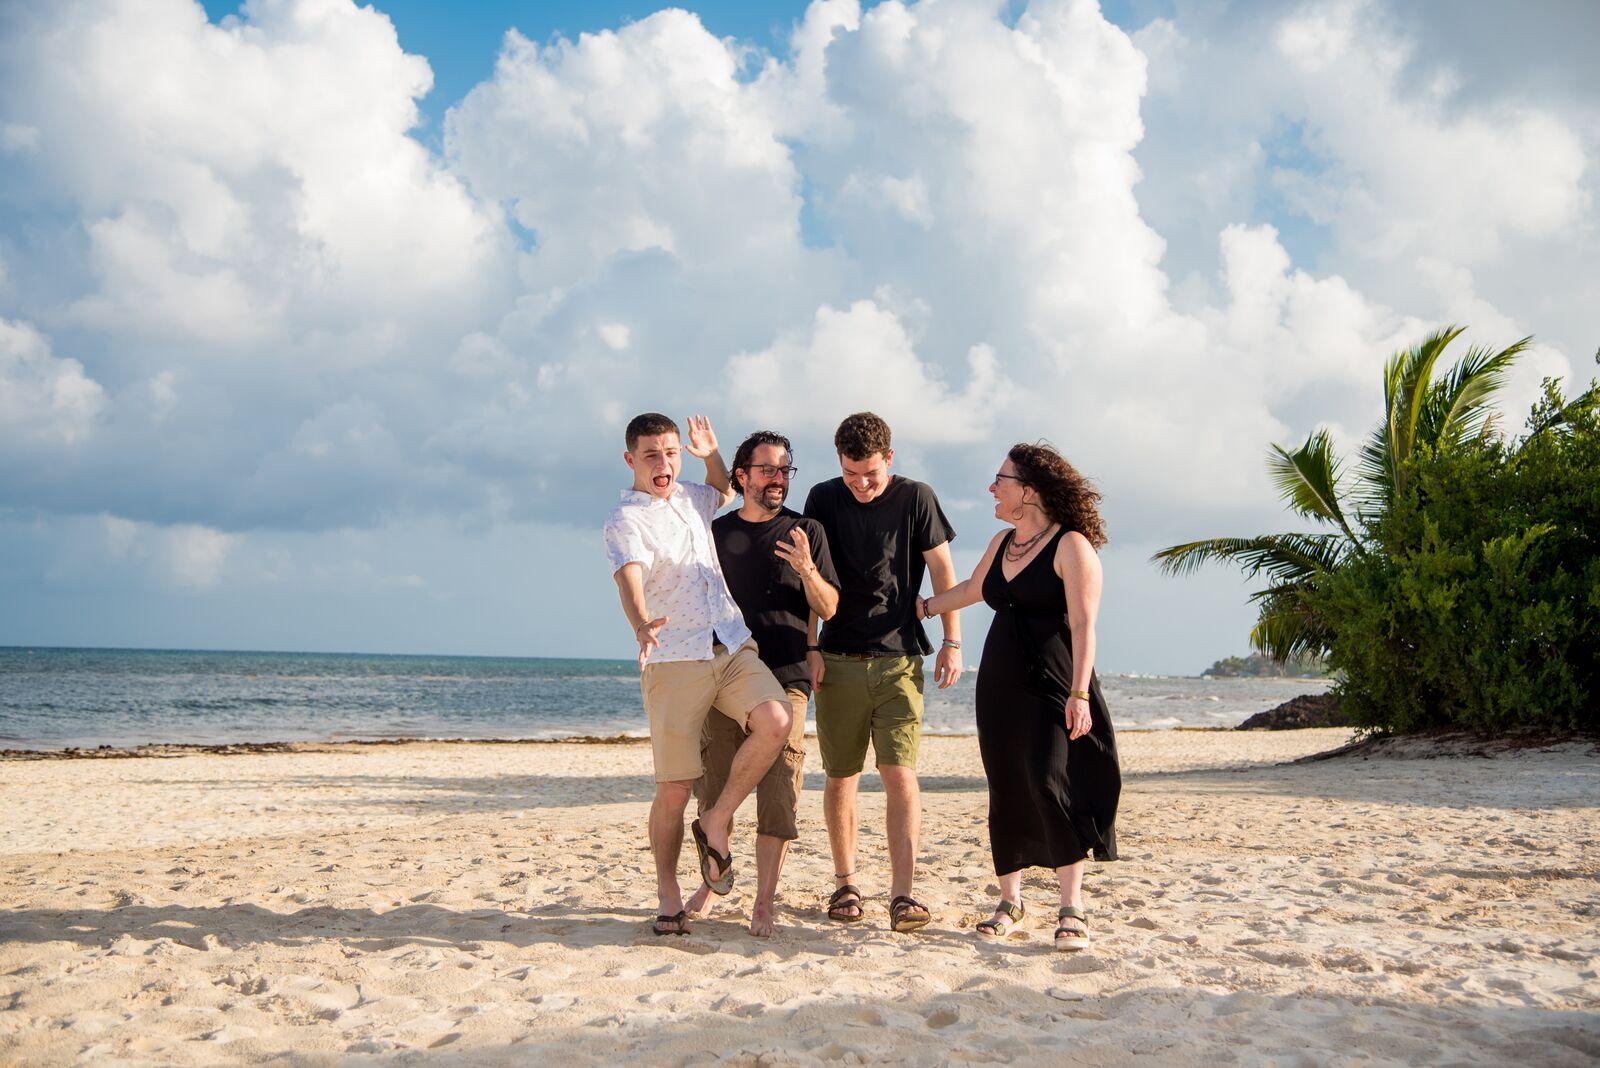 The Kane family on vacation. From left: Eli, Scott, Jesse, Nancy.